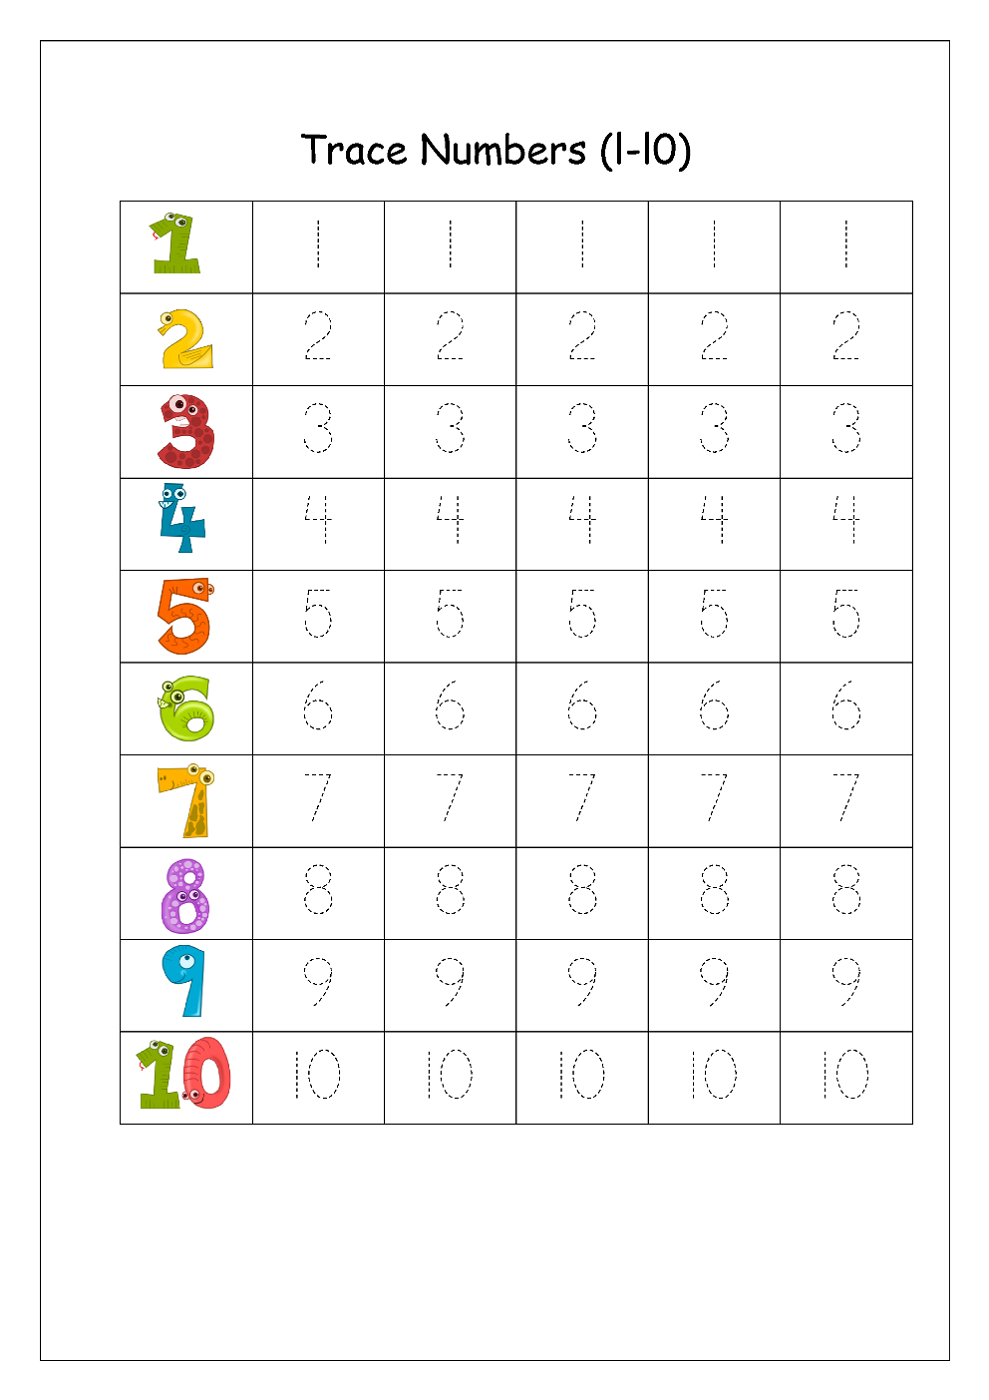 Writing Numbers Worksheet - Kids Learning Activity | Printable | Printable Number Tracing Worksheets